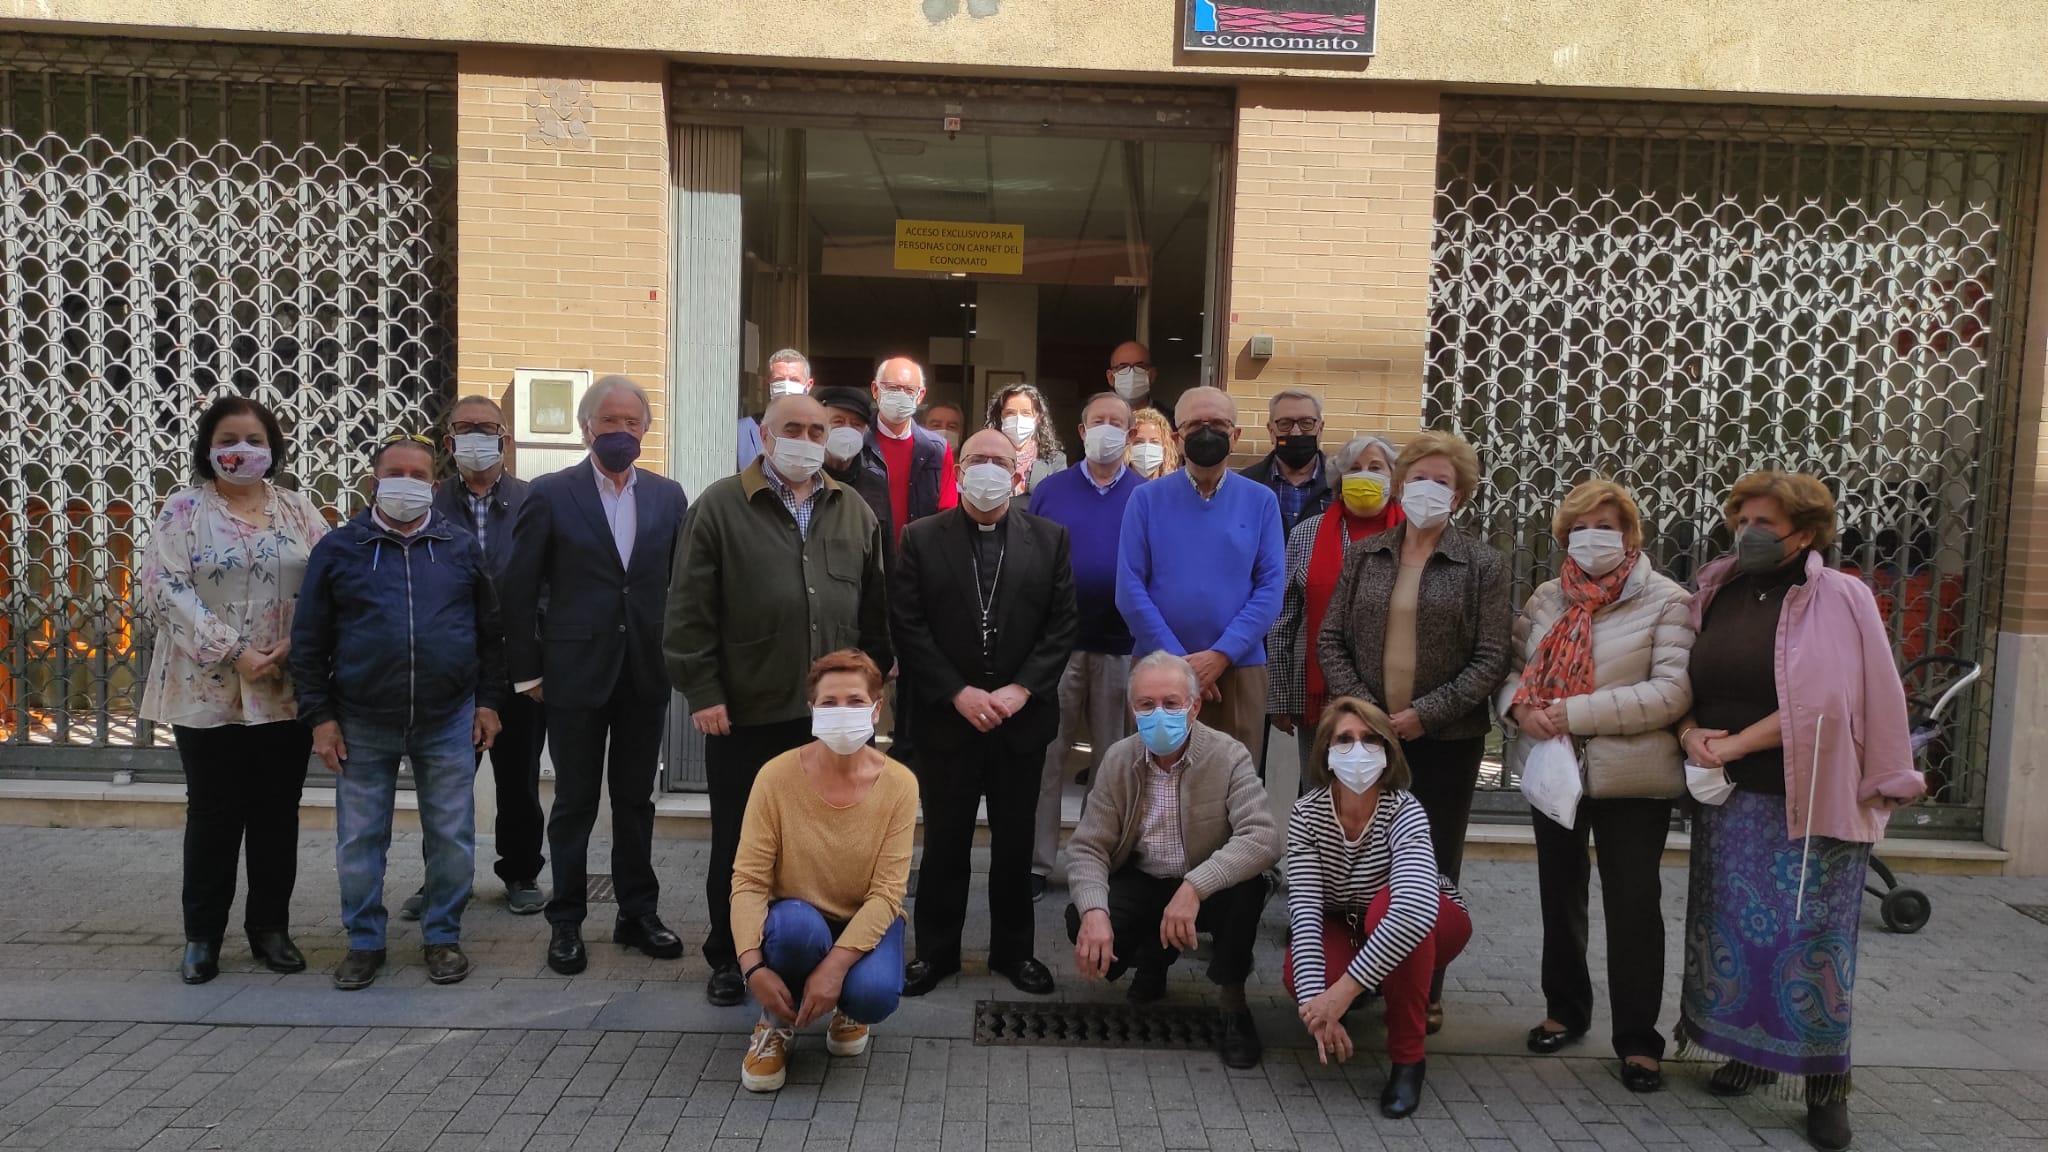 El Obispo de Huelva visita nuestro Economato Solidario Resurgir (2)